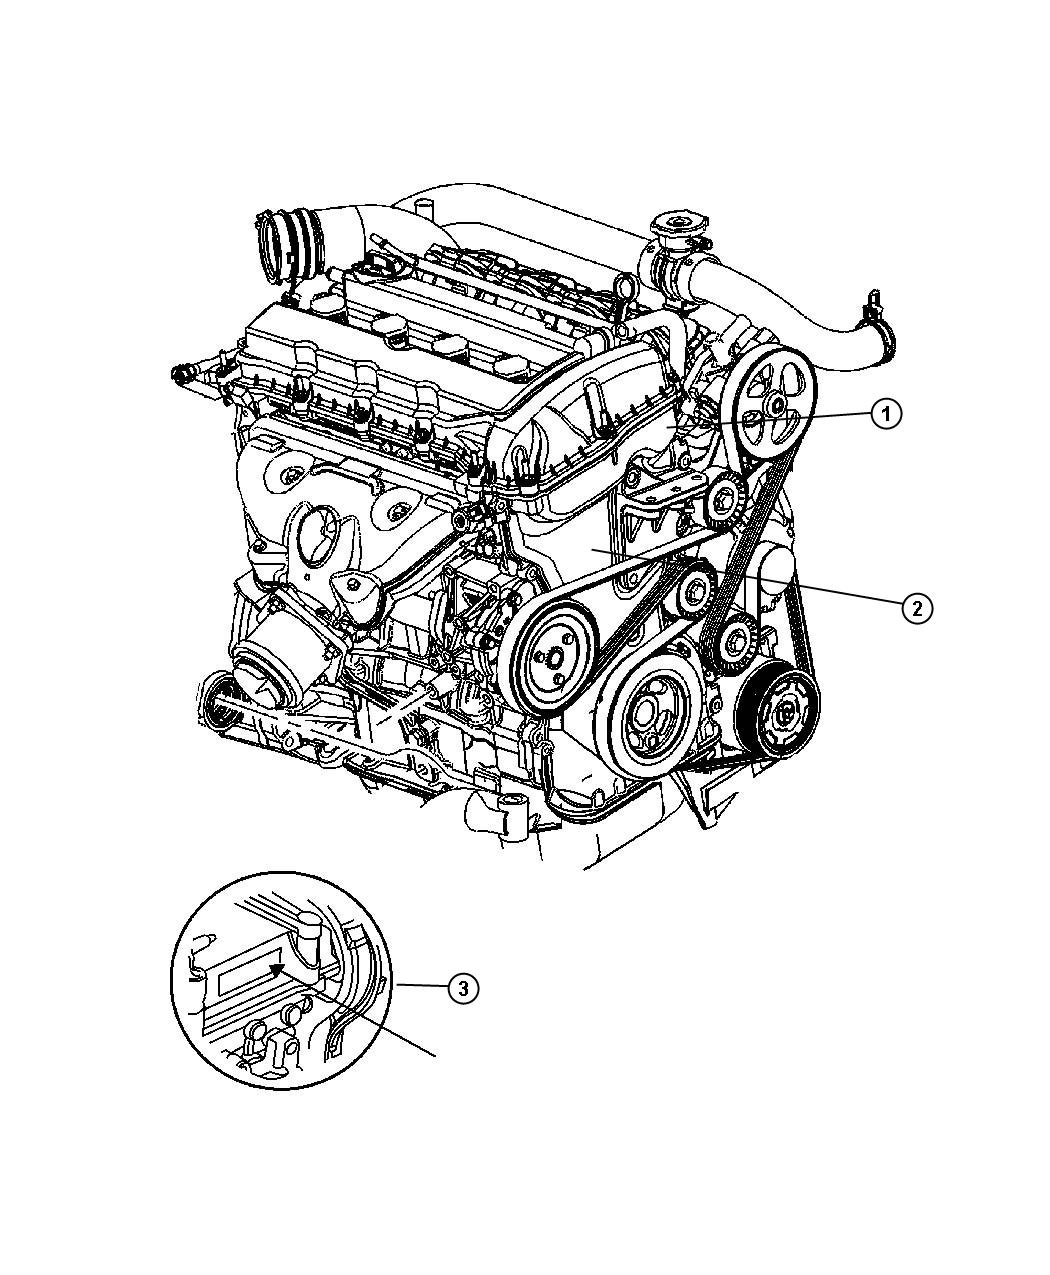 Dodge Caliber Engine Long Block Turbo